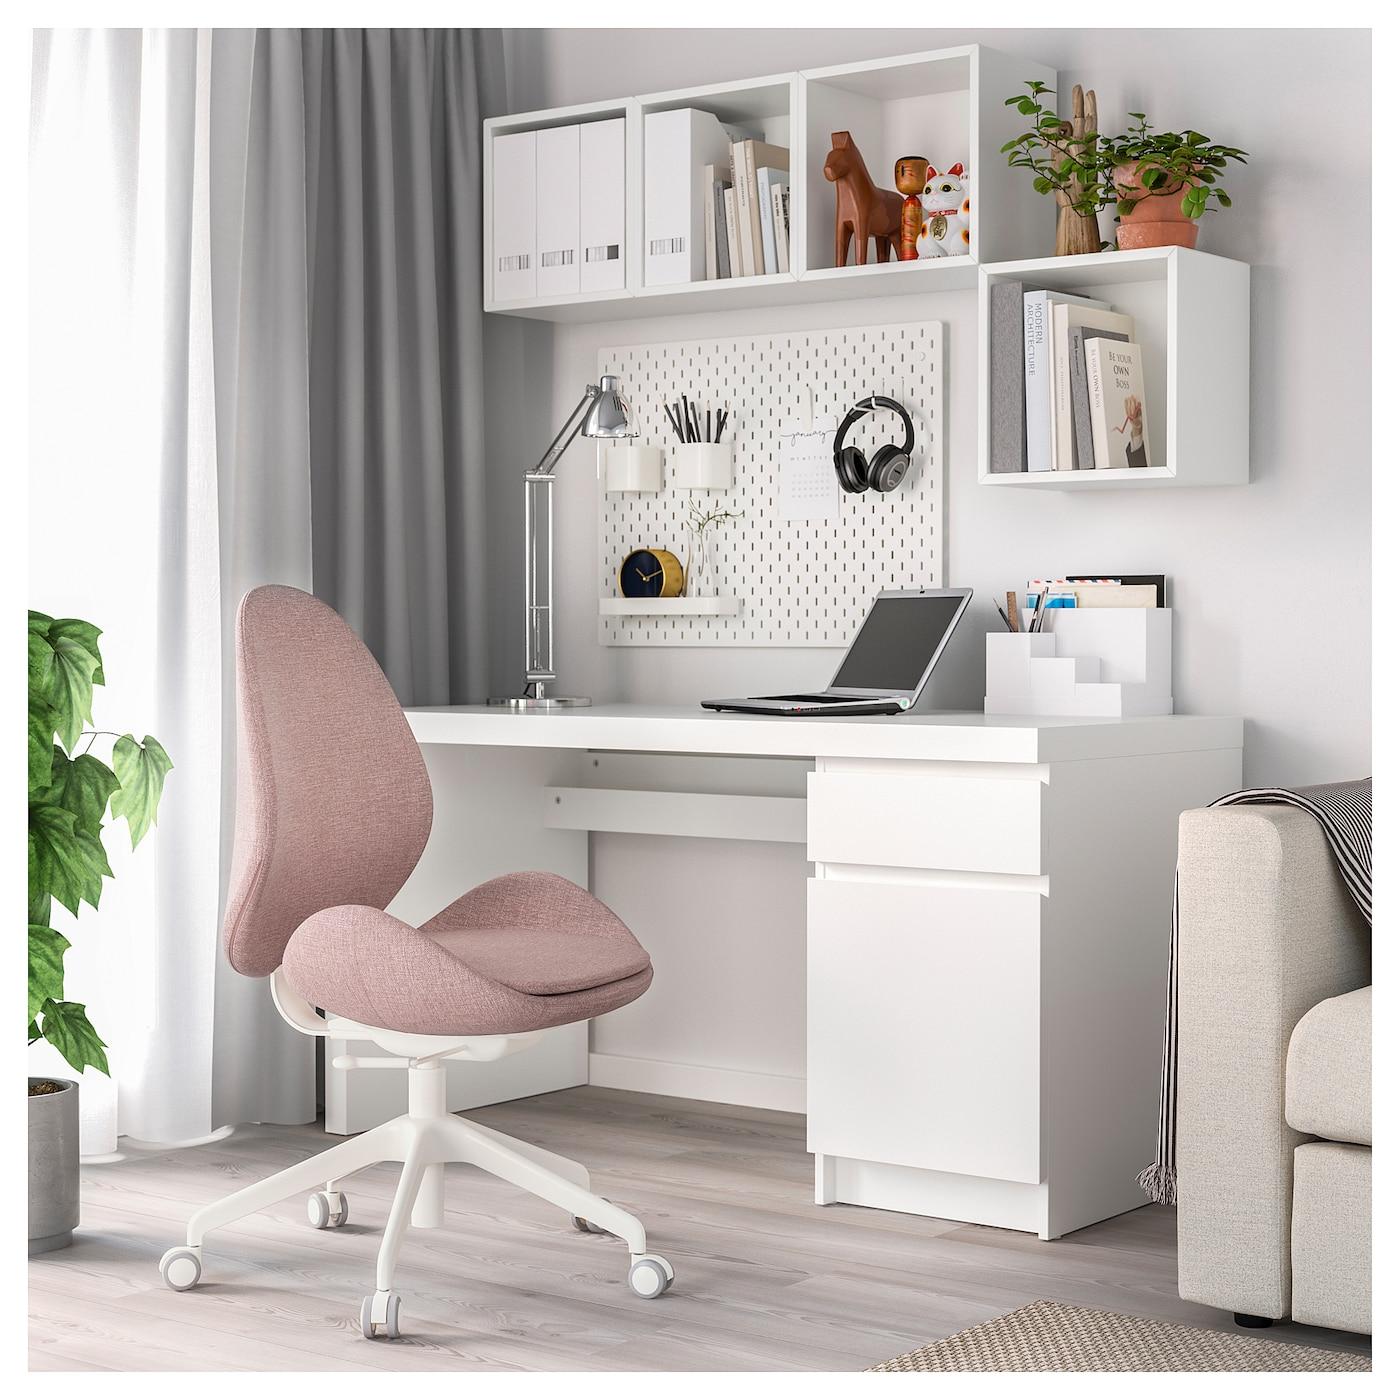 Gunnared Light Brown Pink Office Chair